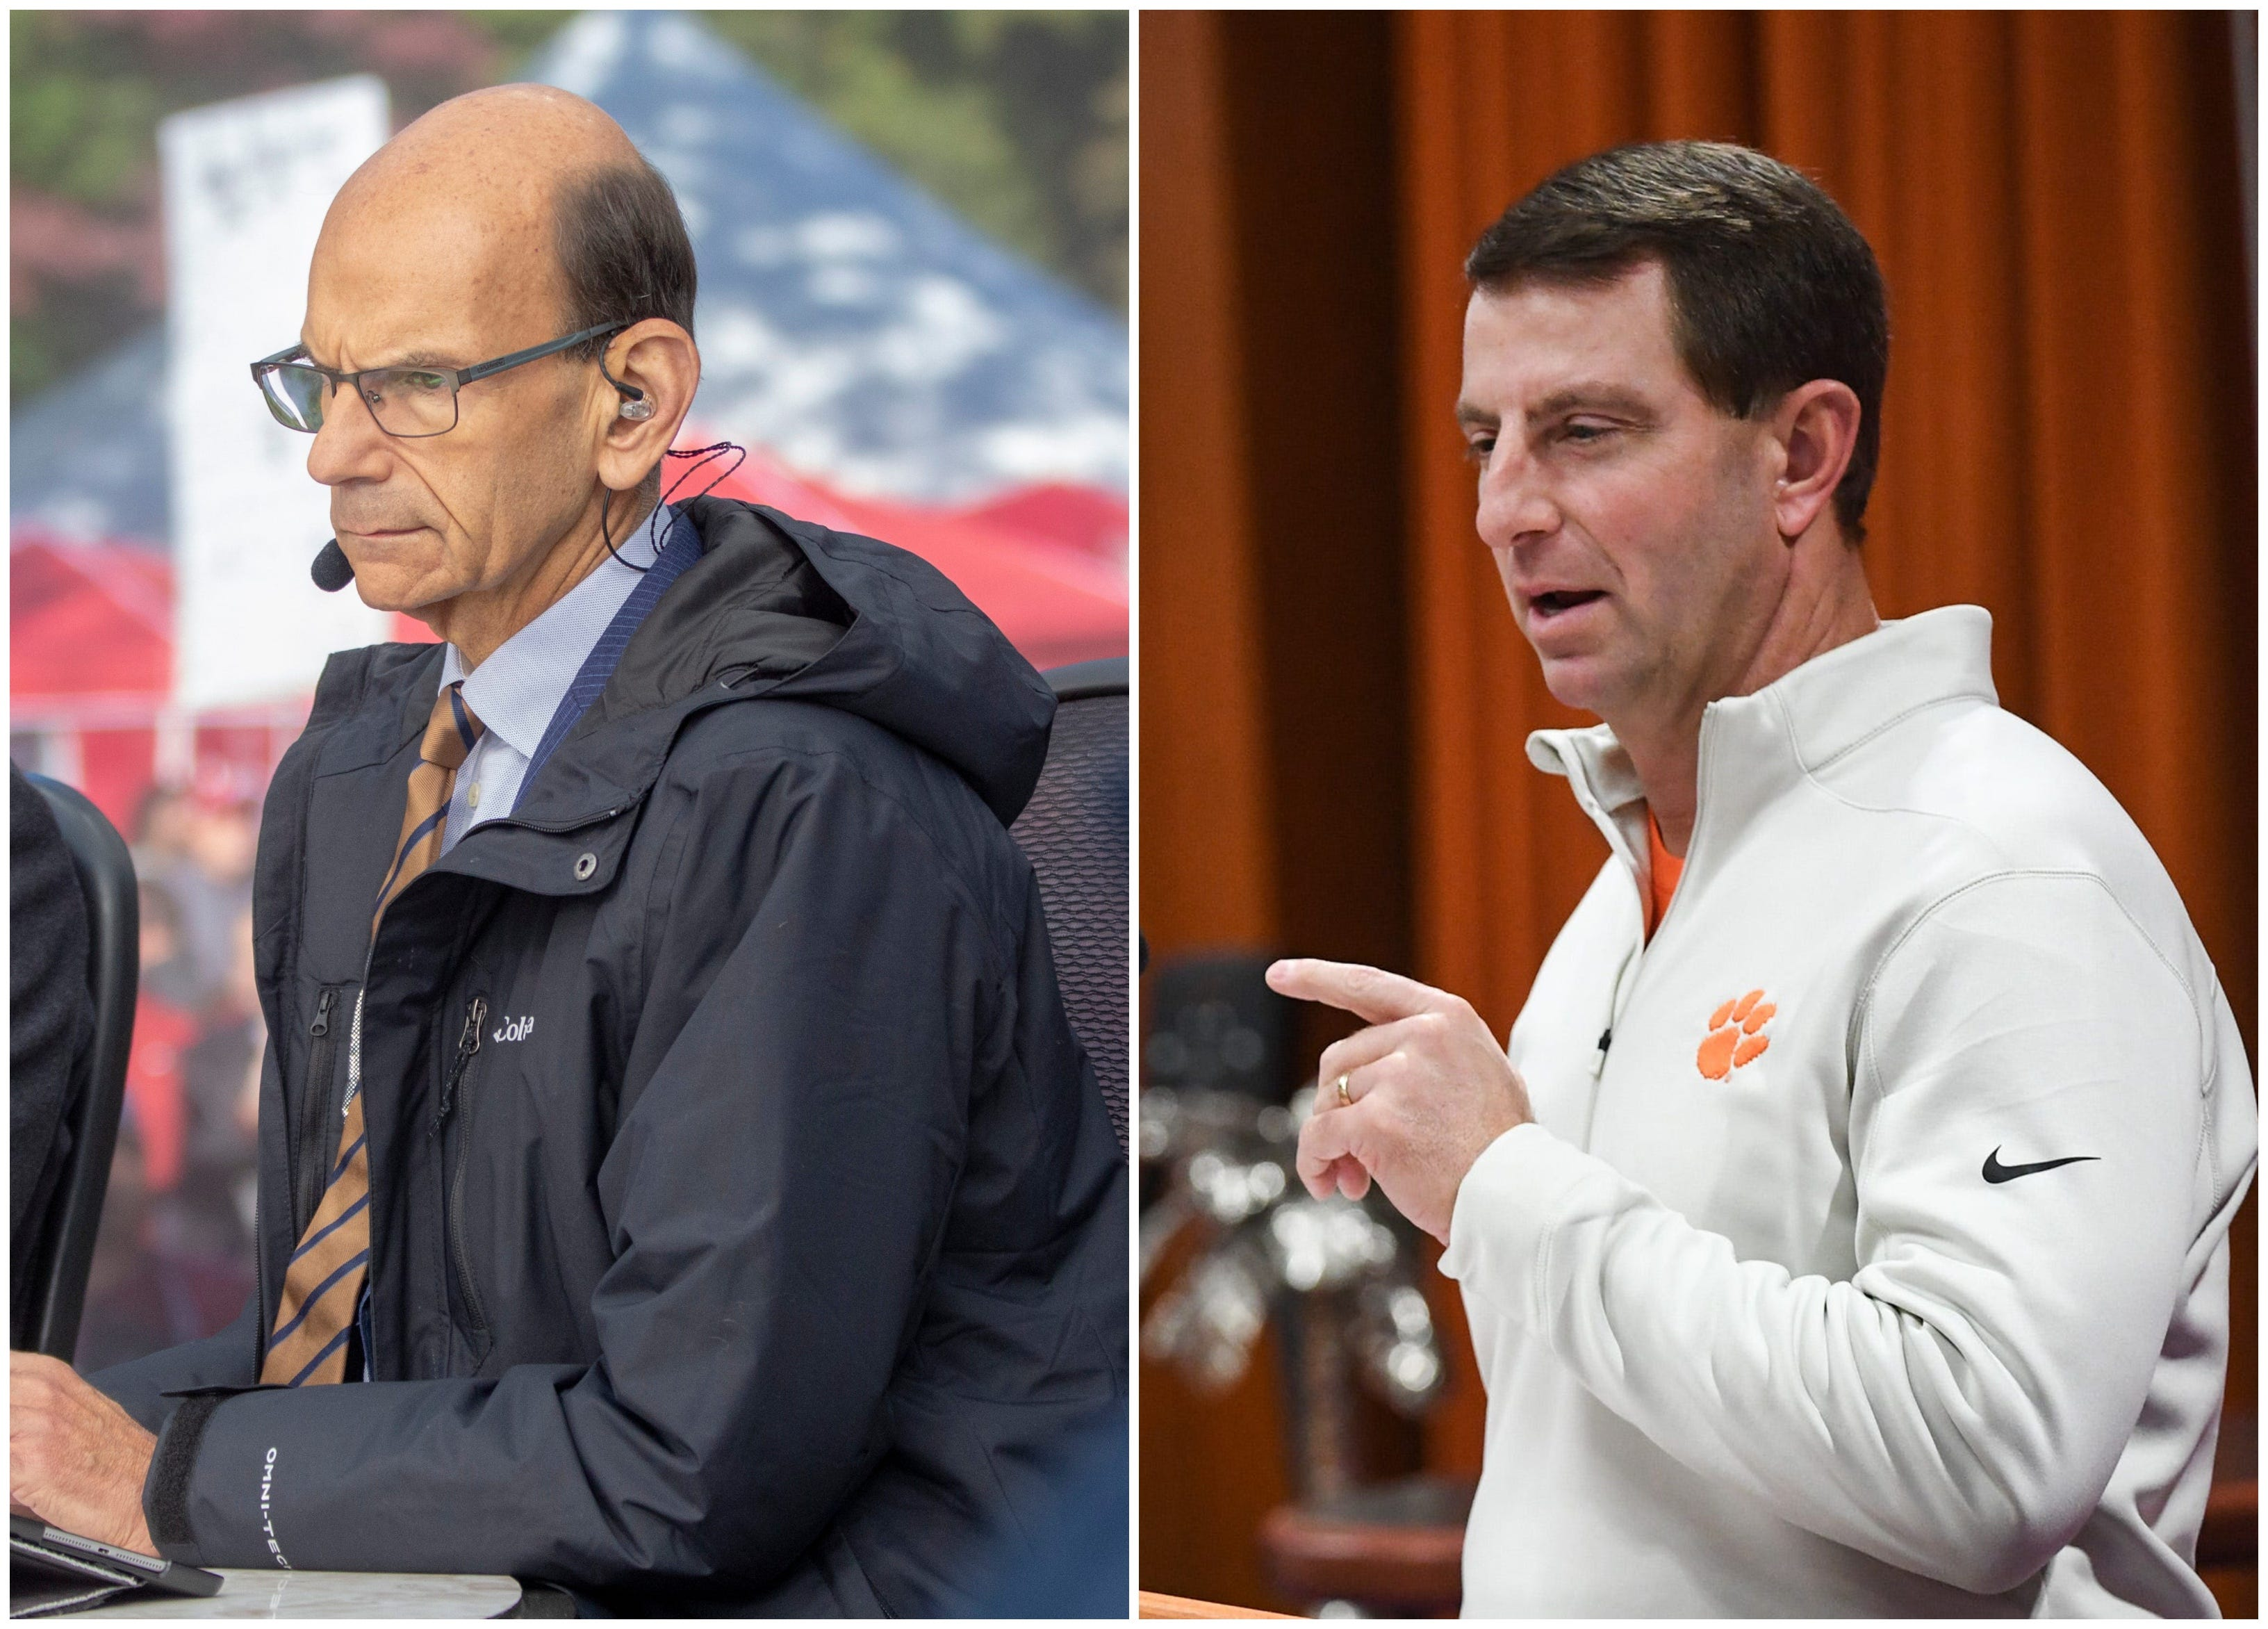 Clemson coach Dabo Swinney responds to Paul Finebaum calling him 'the most annoying winner'